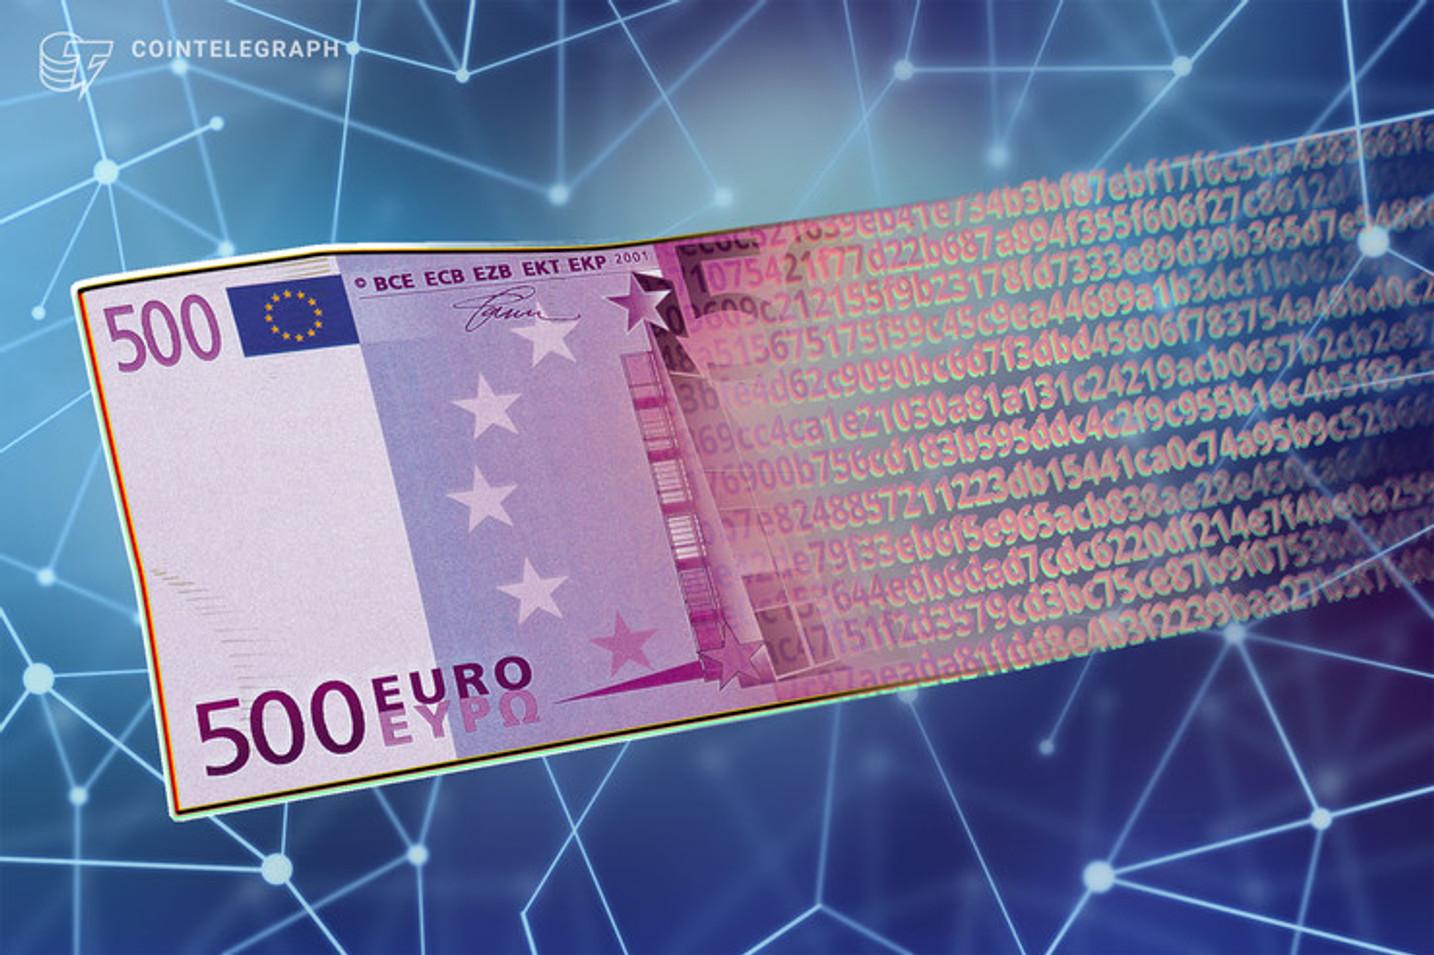 2gether bate su récord histórico con 37 millones de euros transaccionados en trading de criptodivisas